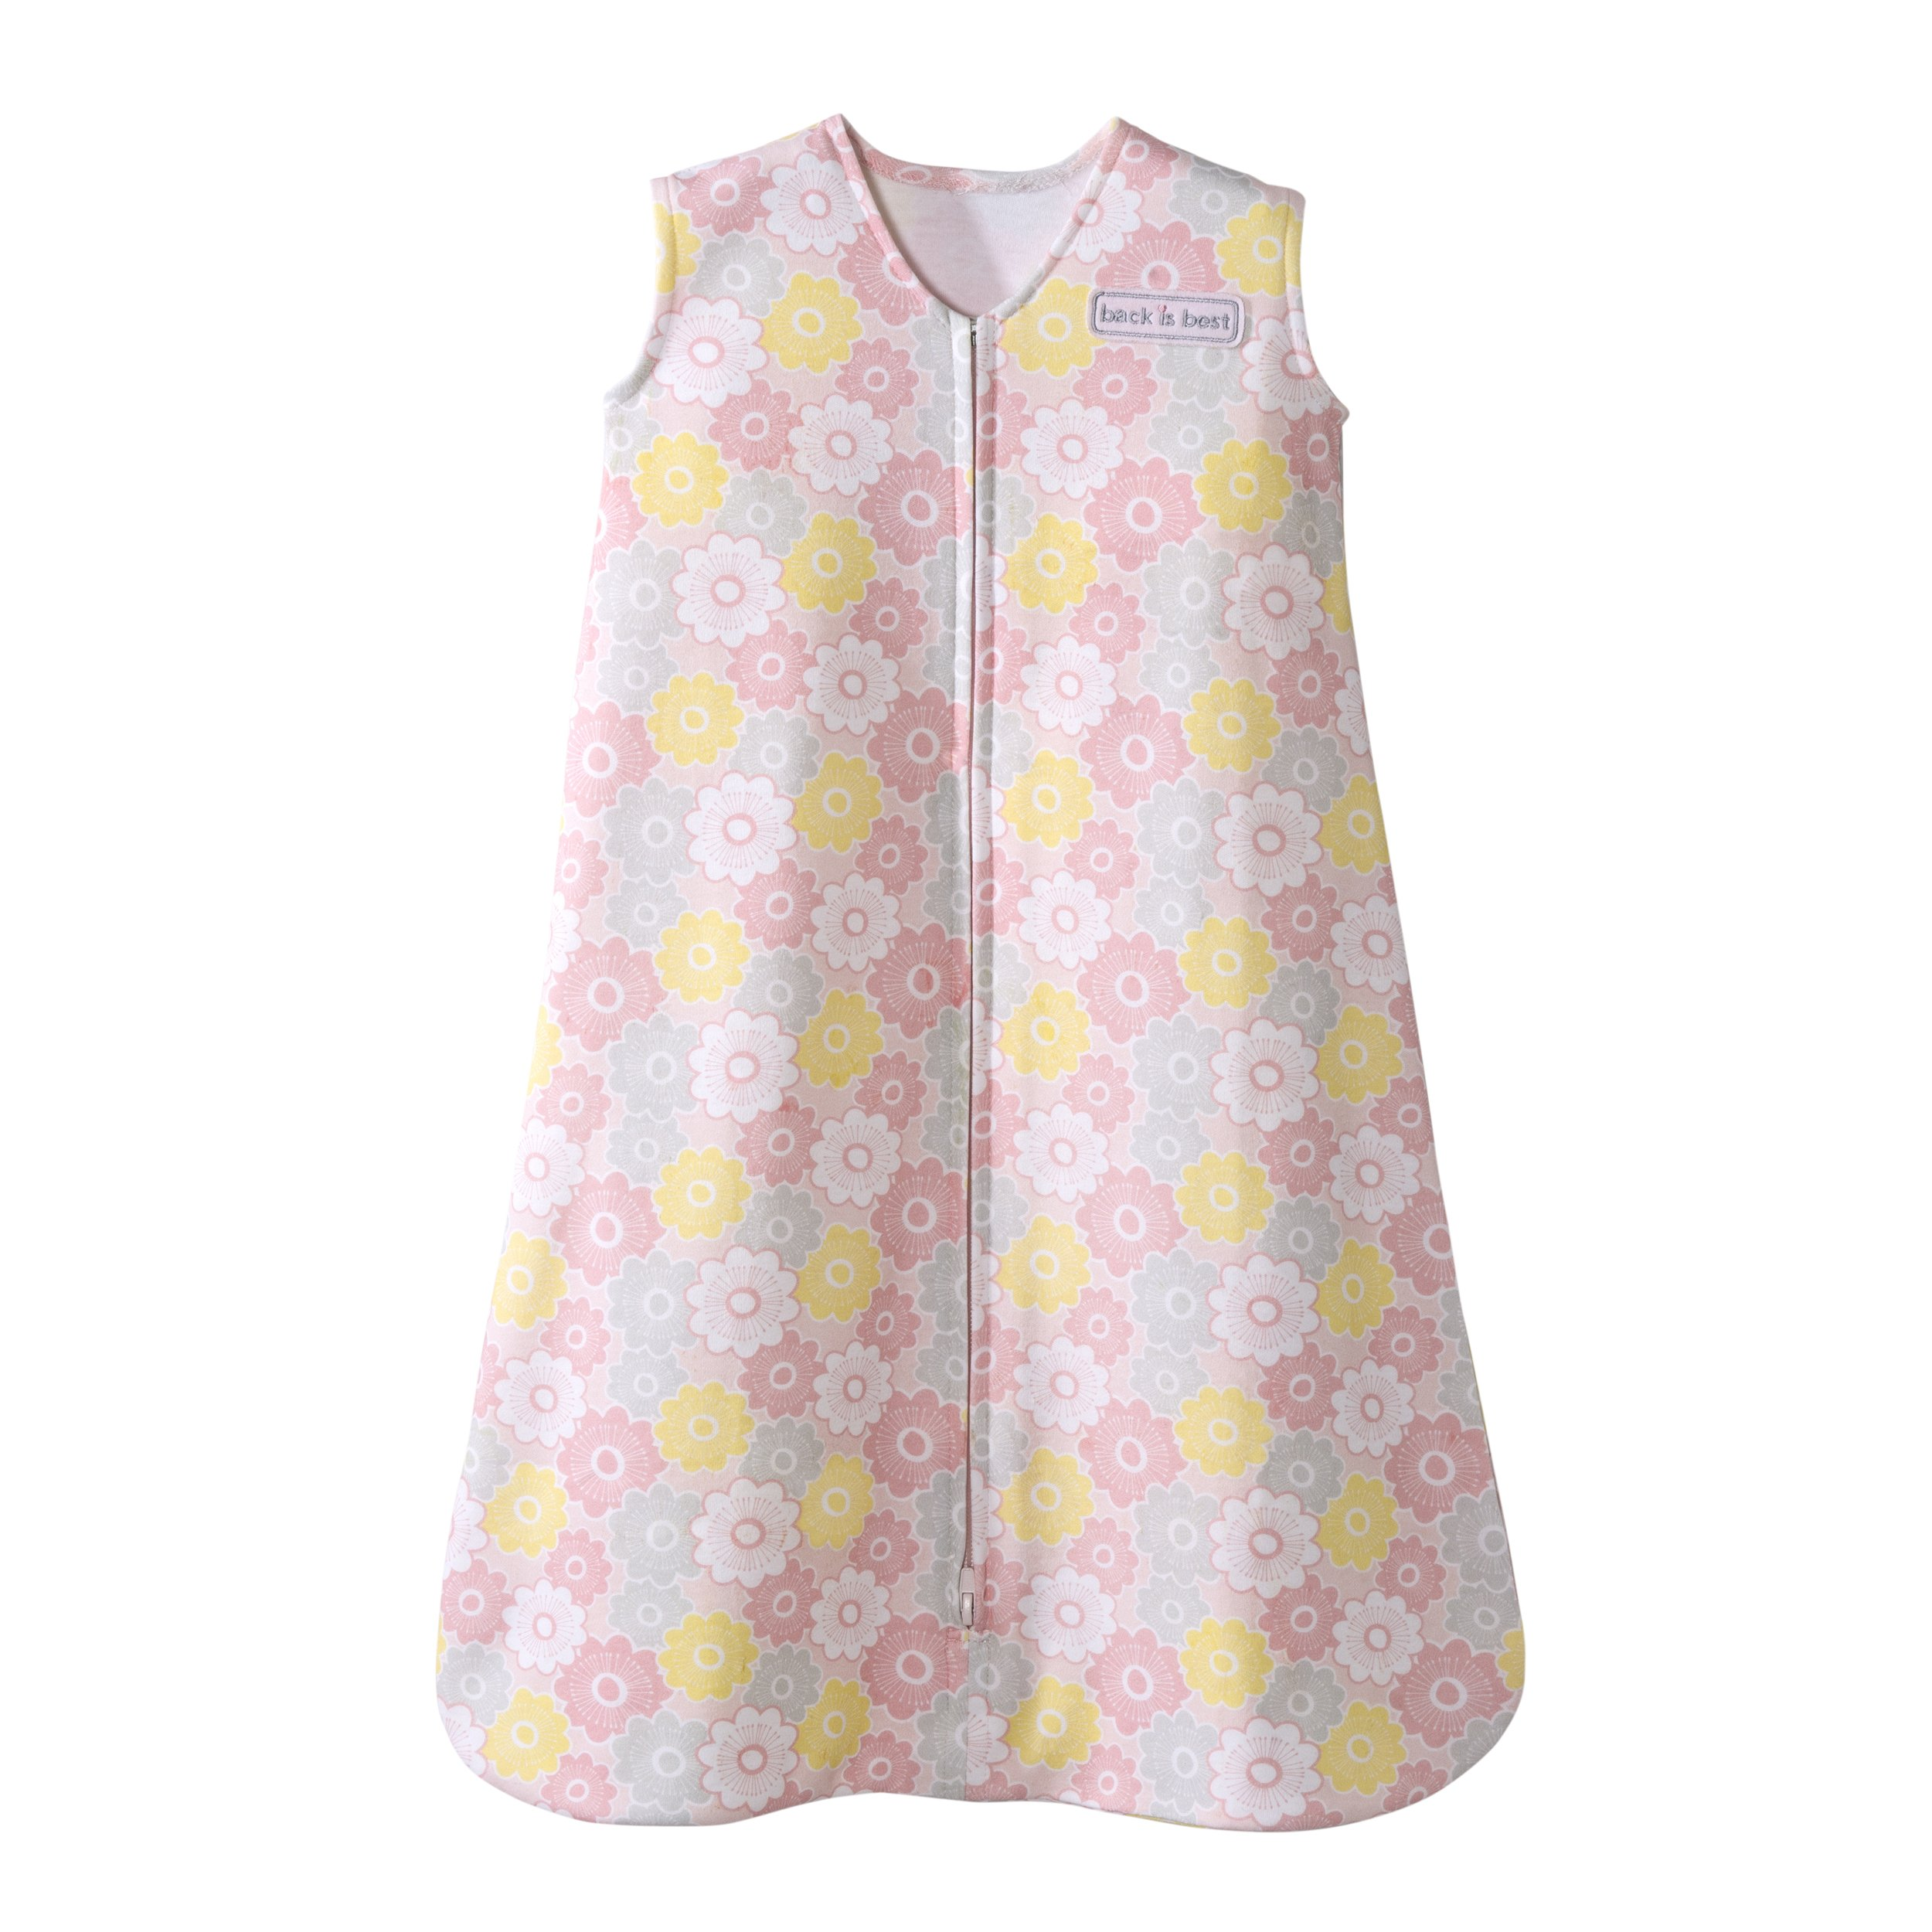 Halo SleepSack 100% Cotton Wearable Blanket, Grey and Pink Flowers, Medium